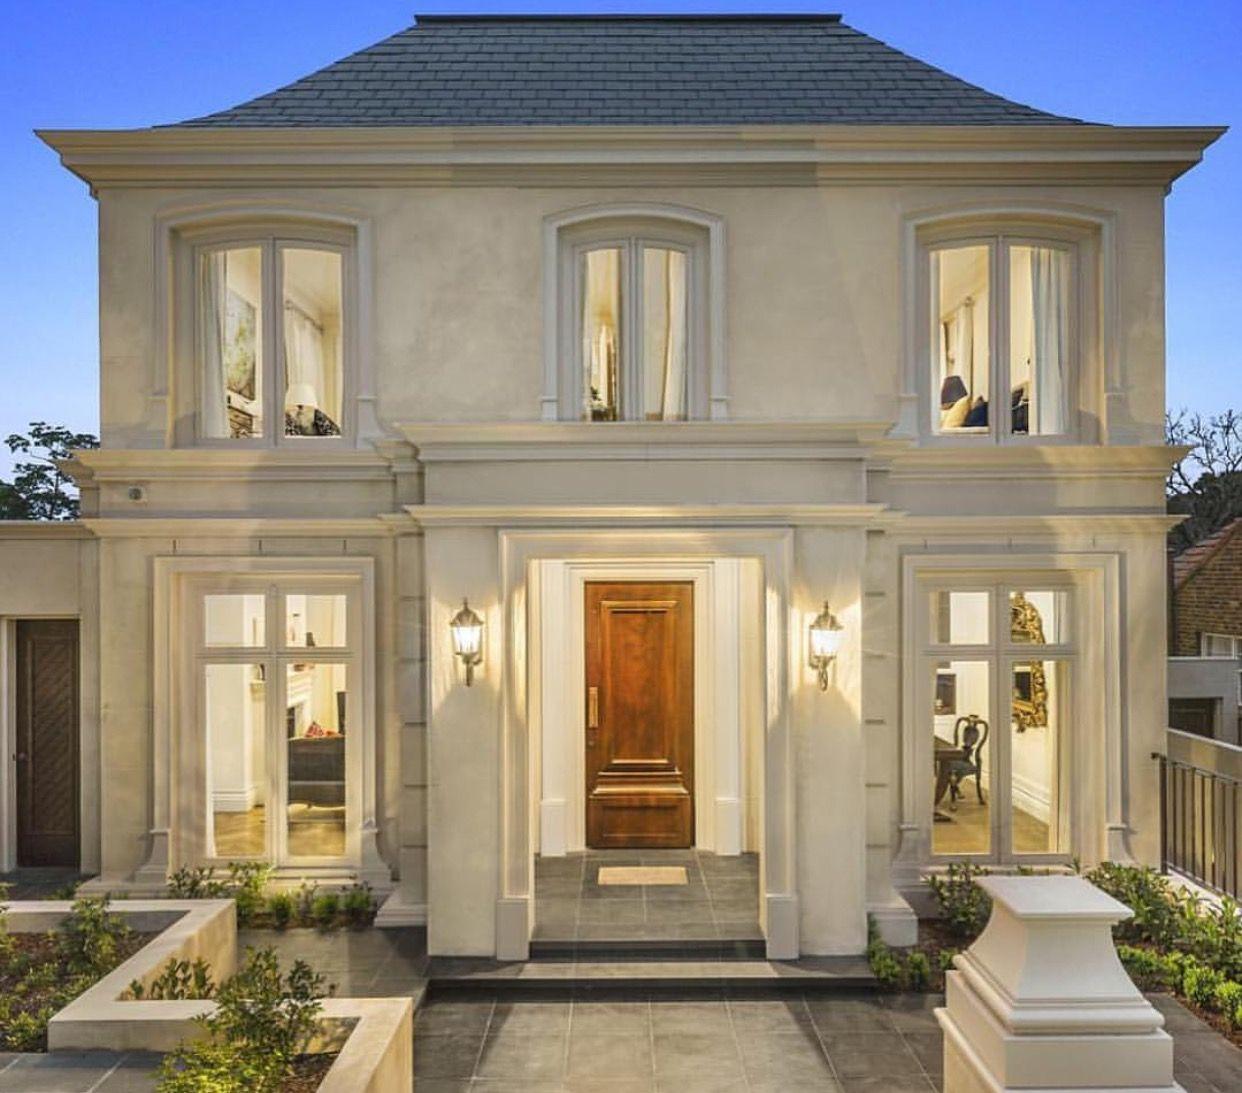 Neo Klasik: Beberapa Inspirasi Fasad-Fasad Bangunan